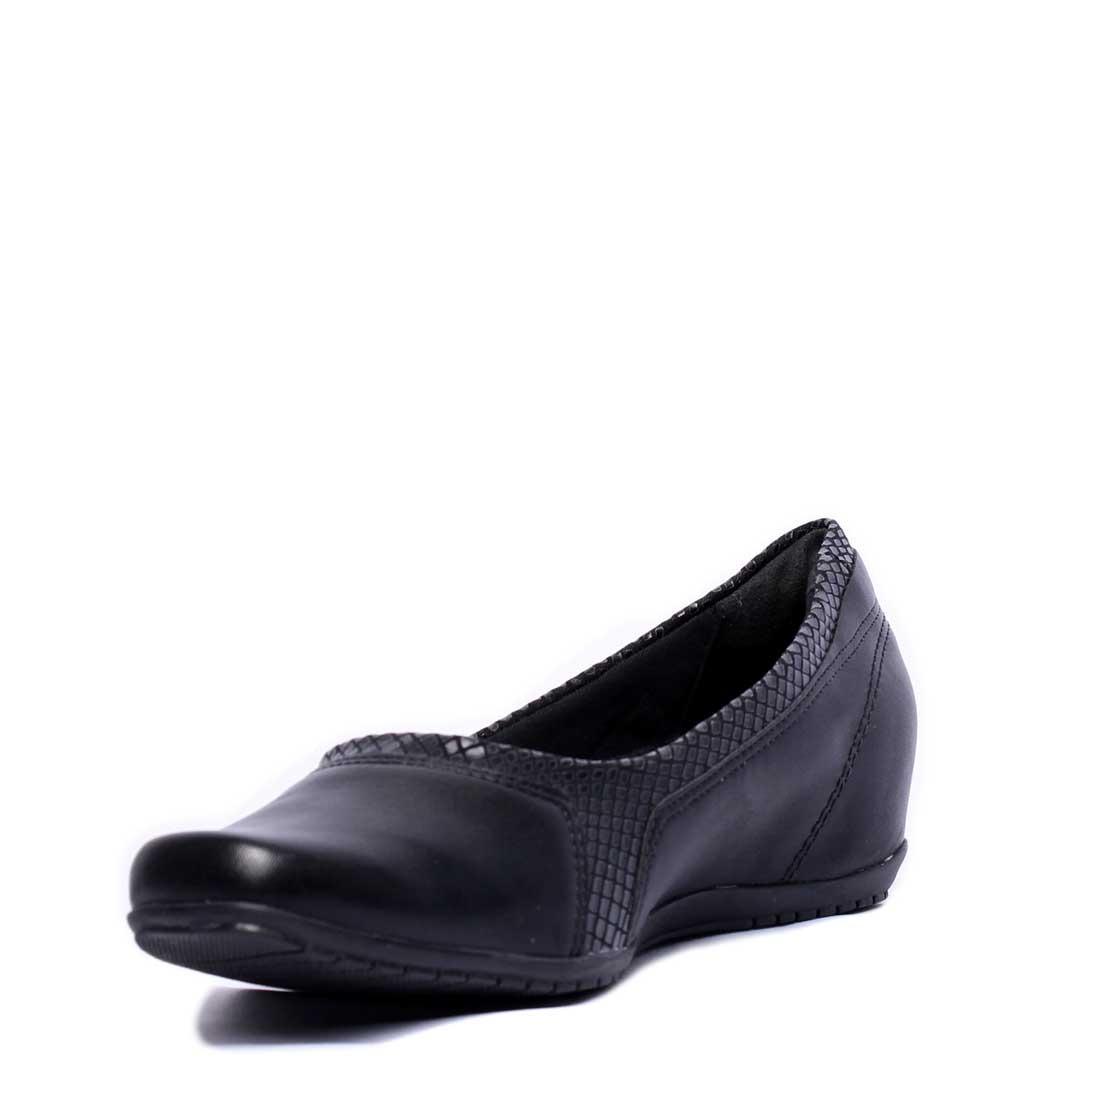 7f79f1200 Carregando zoom... 4 sapato feminino casual comfortflex flats ultrasoft